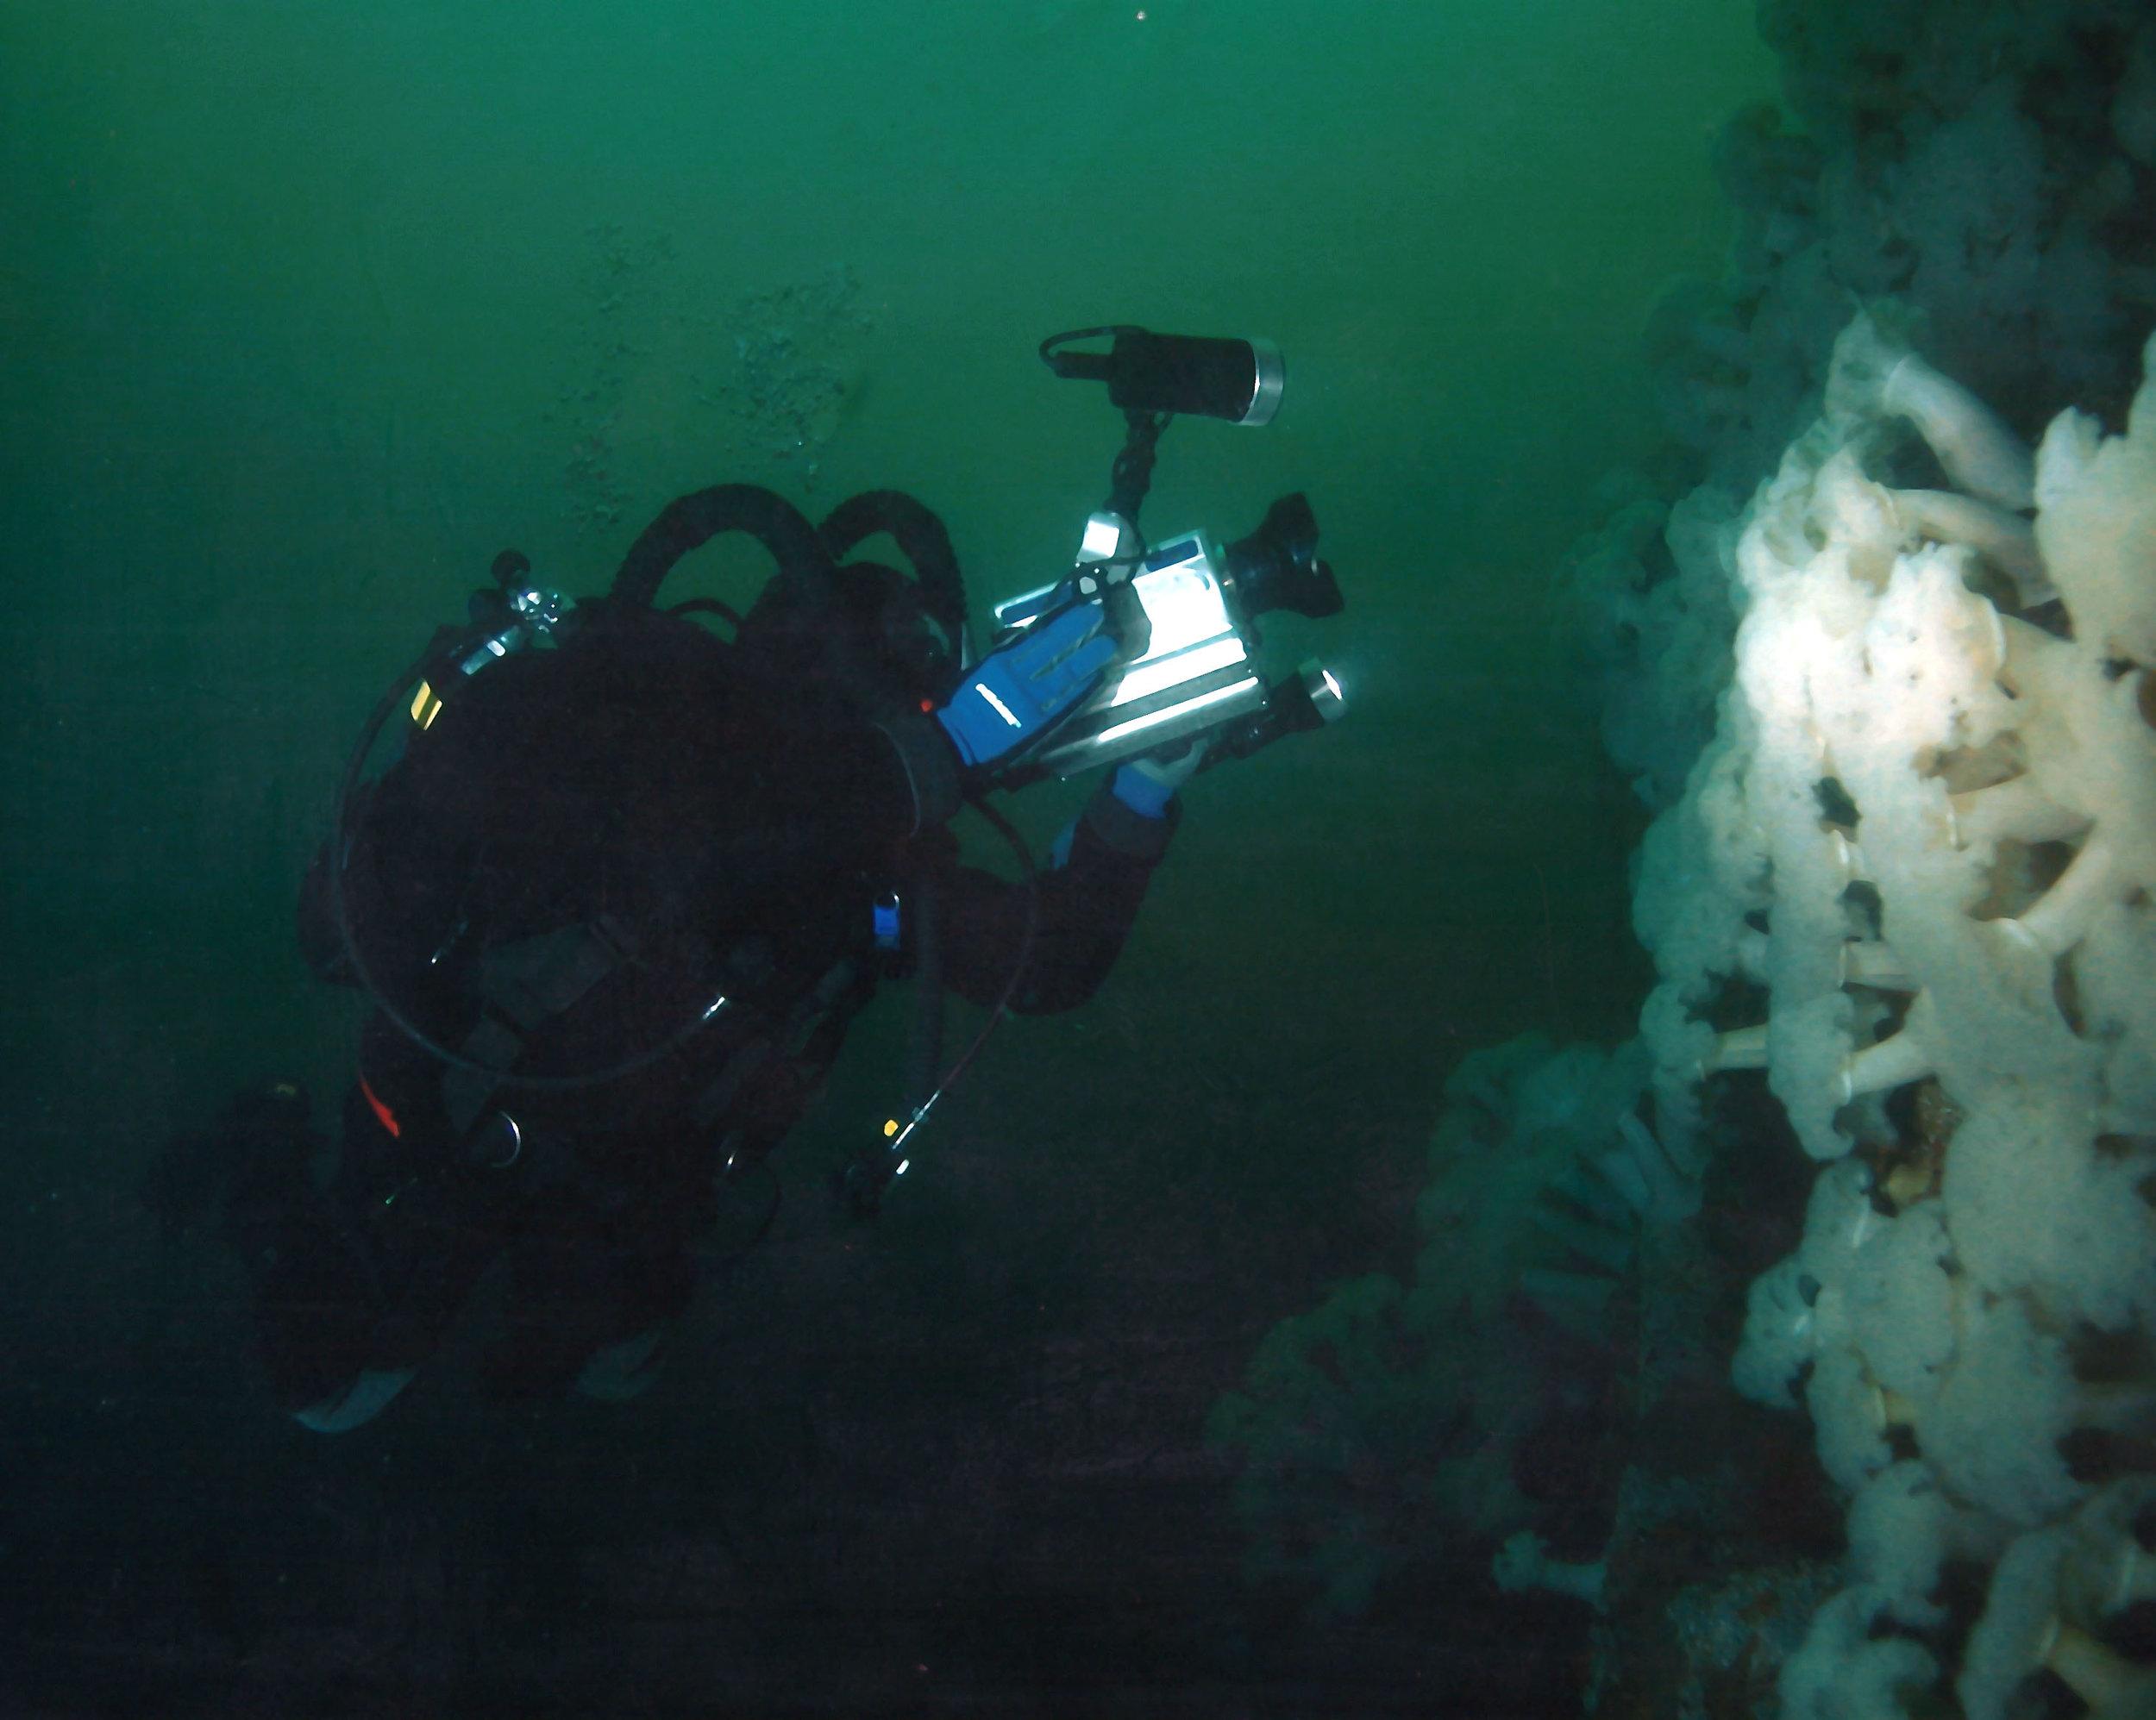 Paul shooting underwater video using a rebreather.